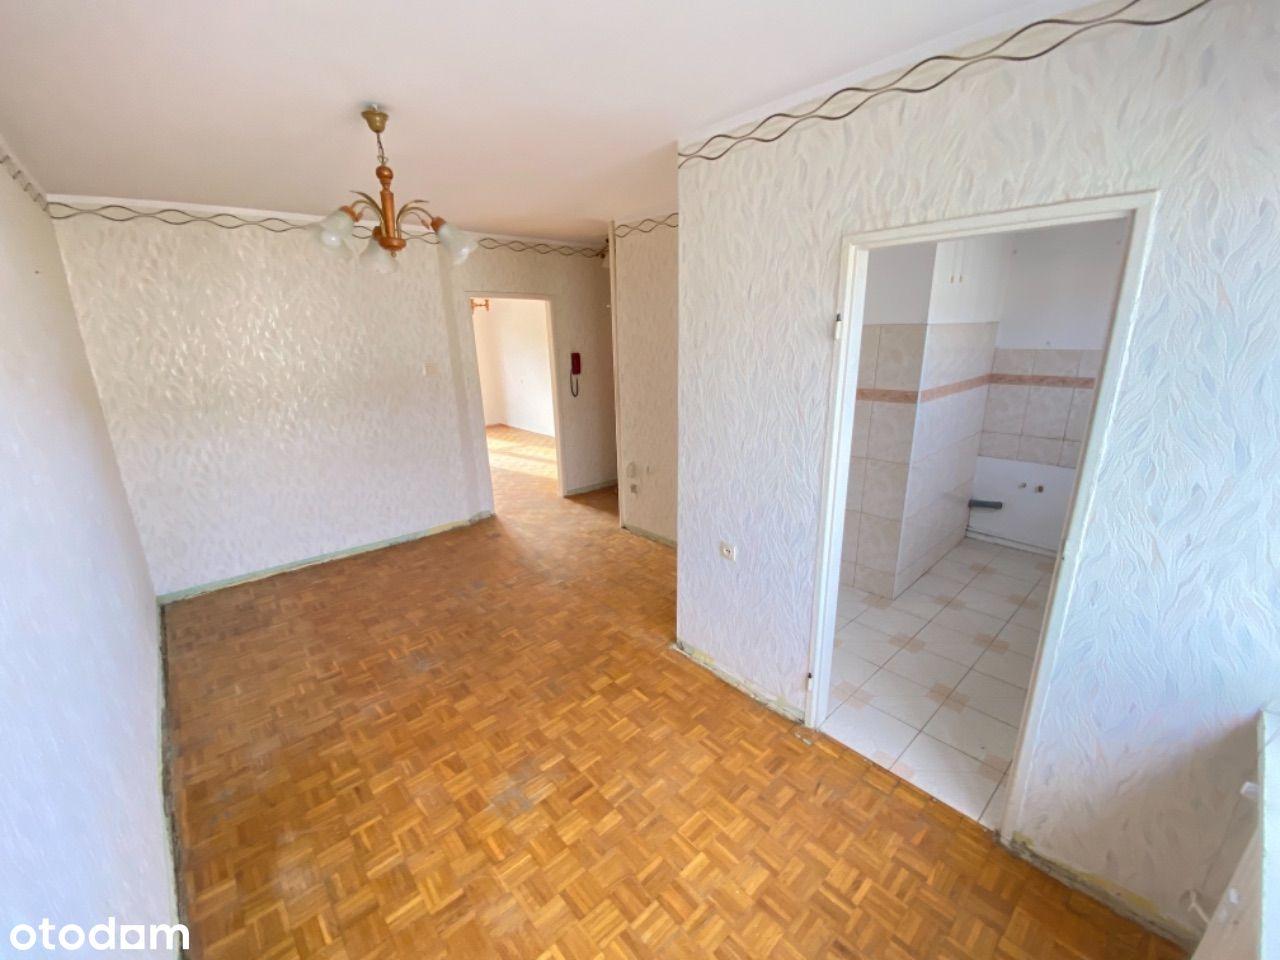 Do zamieszkania/remontu, 51m, 3 piętro, balkon